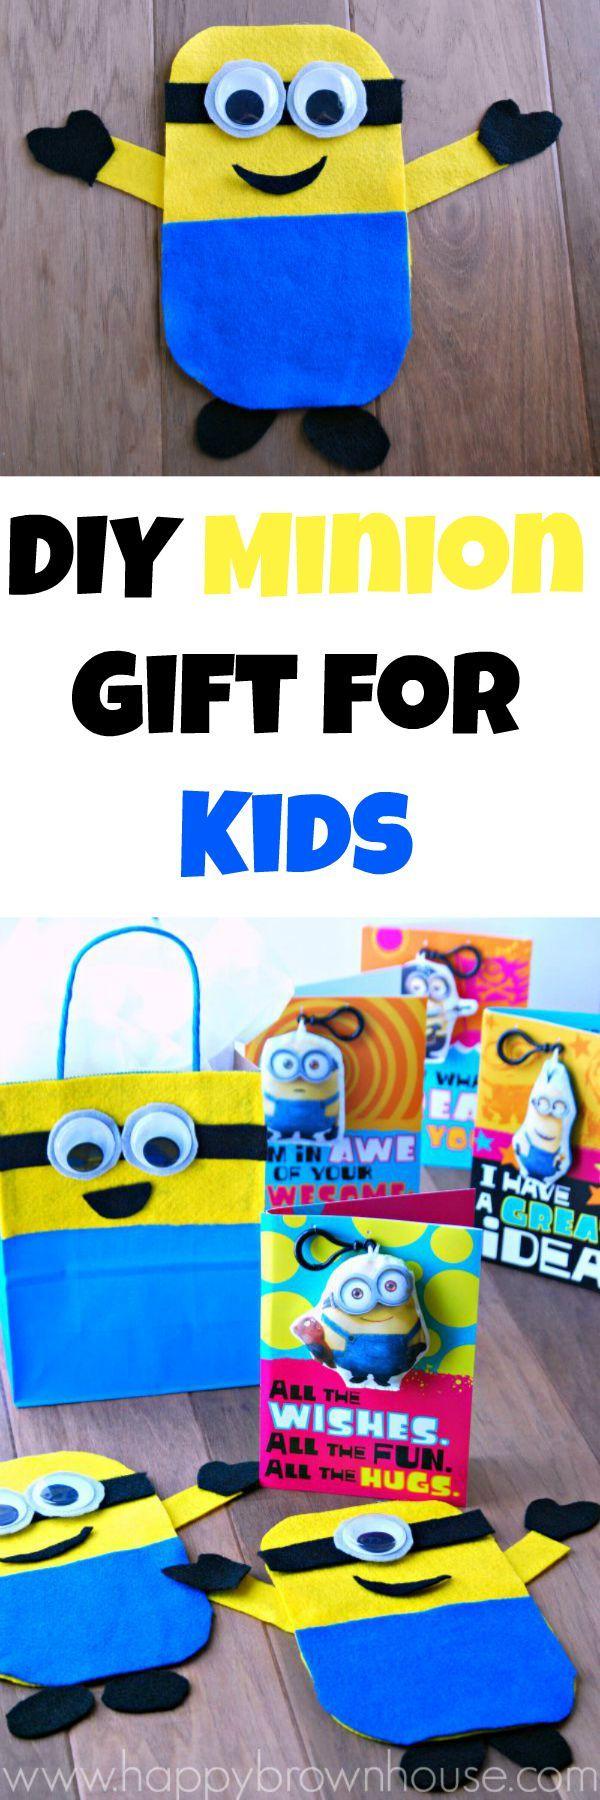 Adorable DIY Minion Gift for Kids including a Build-a-Minion Busy Bag Game, DIY Minion Gift Bag, and adorable Minion Clip Cards from Hallmark #sendsmiles #CollectiveBias